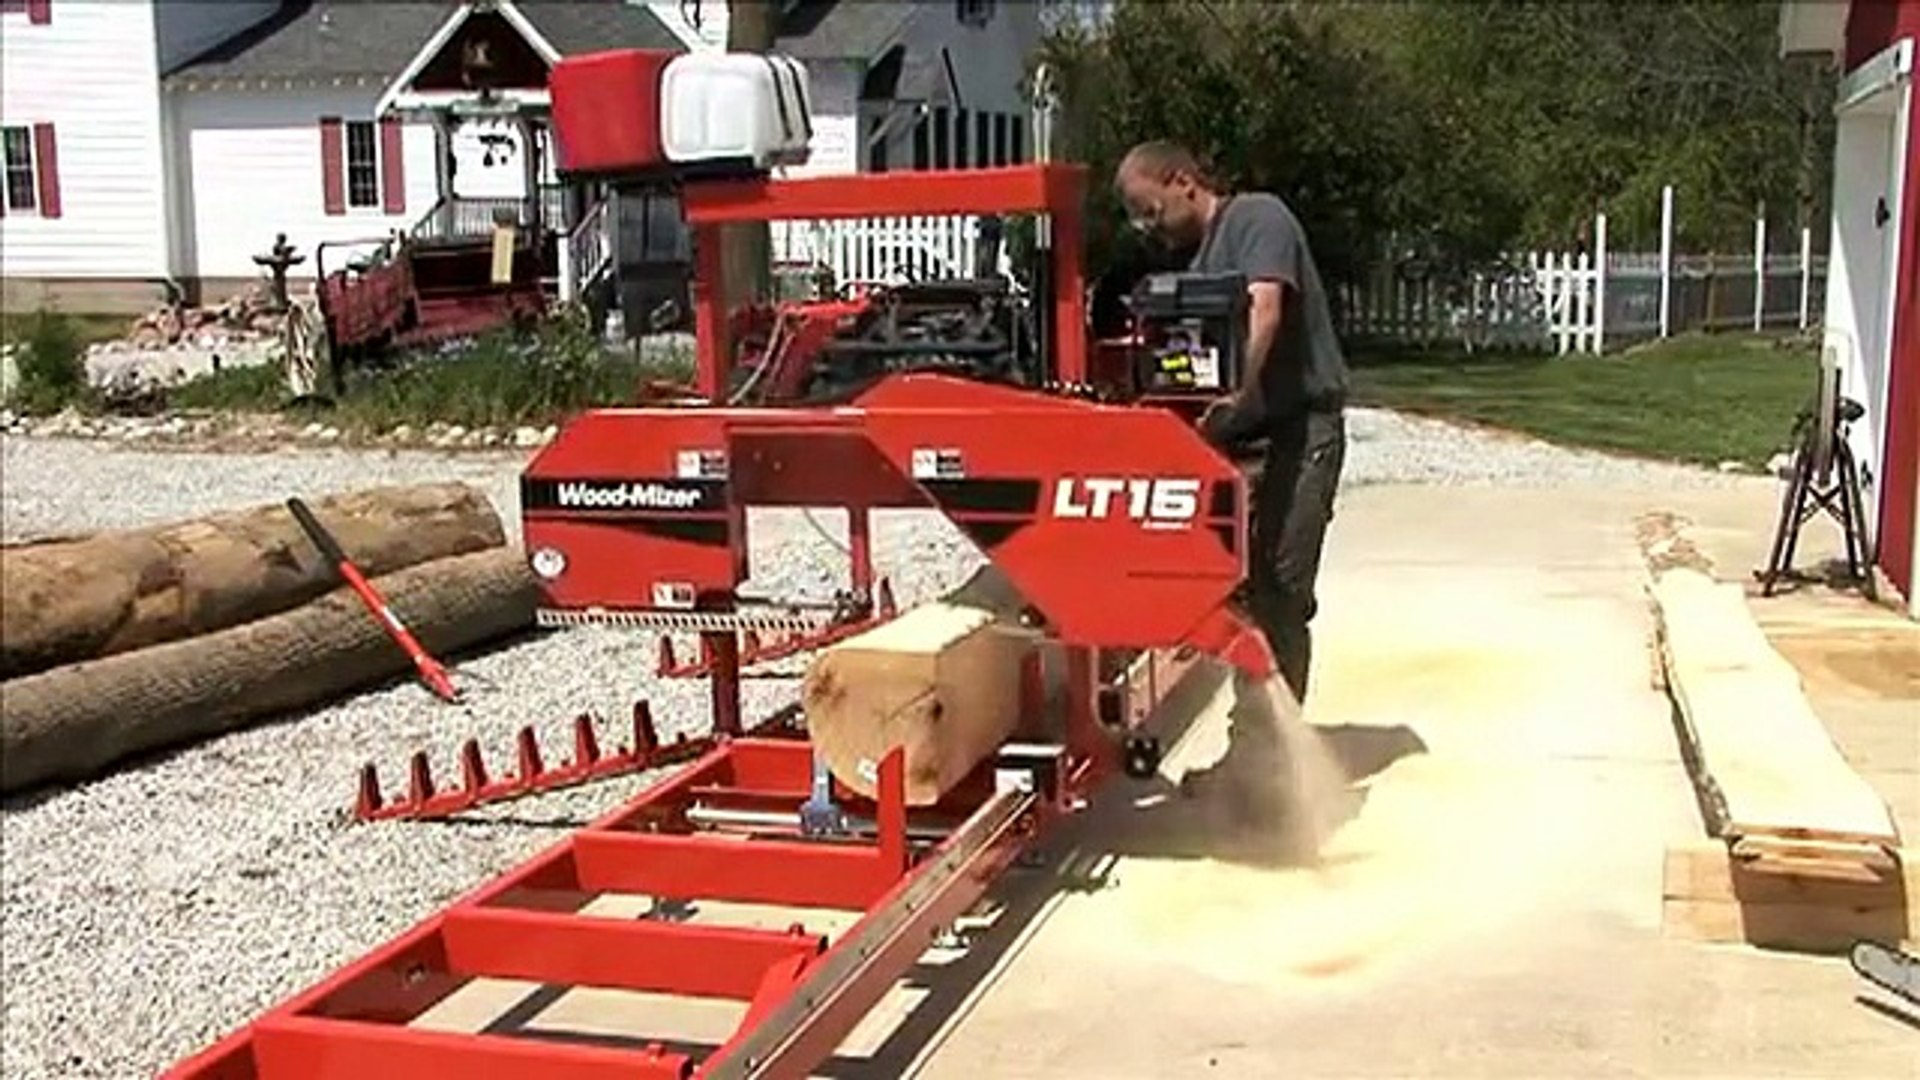 Wood-Mizer LT15 Sawmill - Start sawing your own lumber